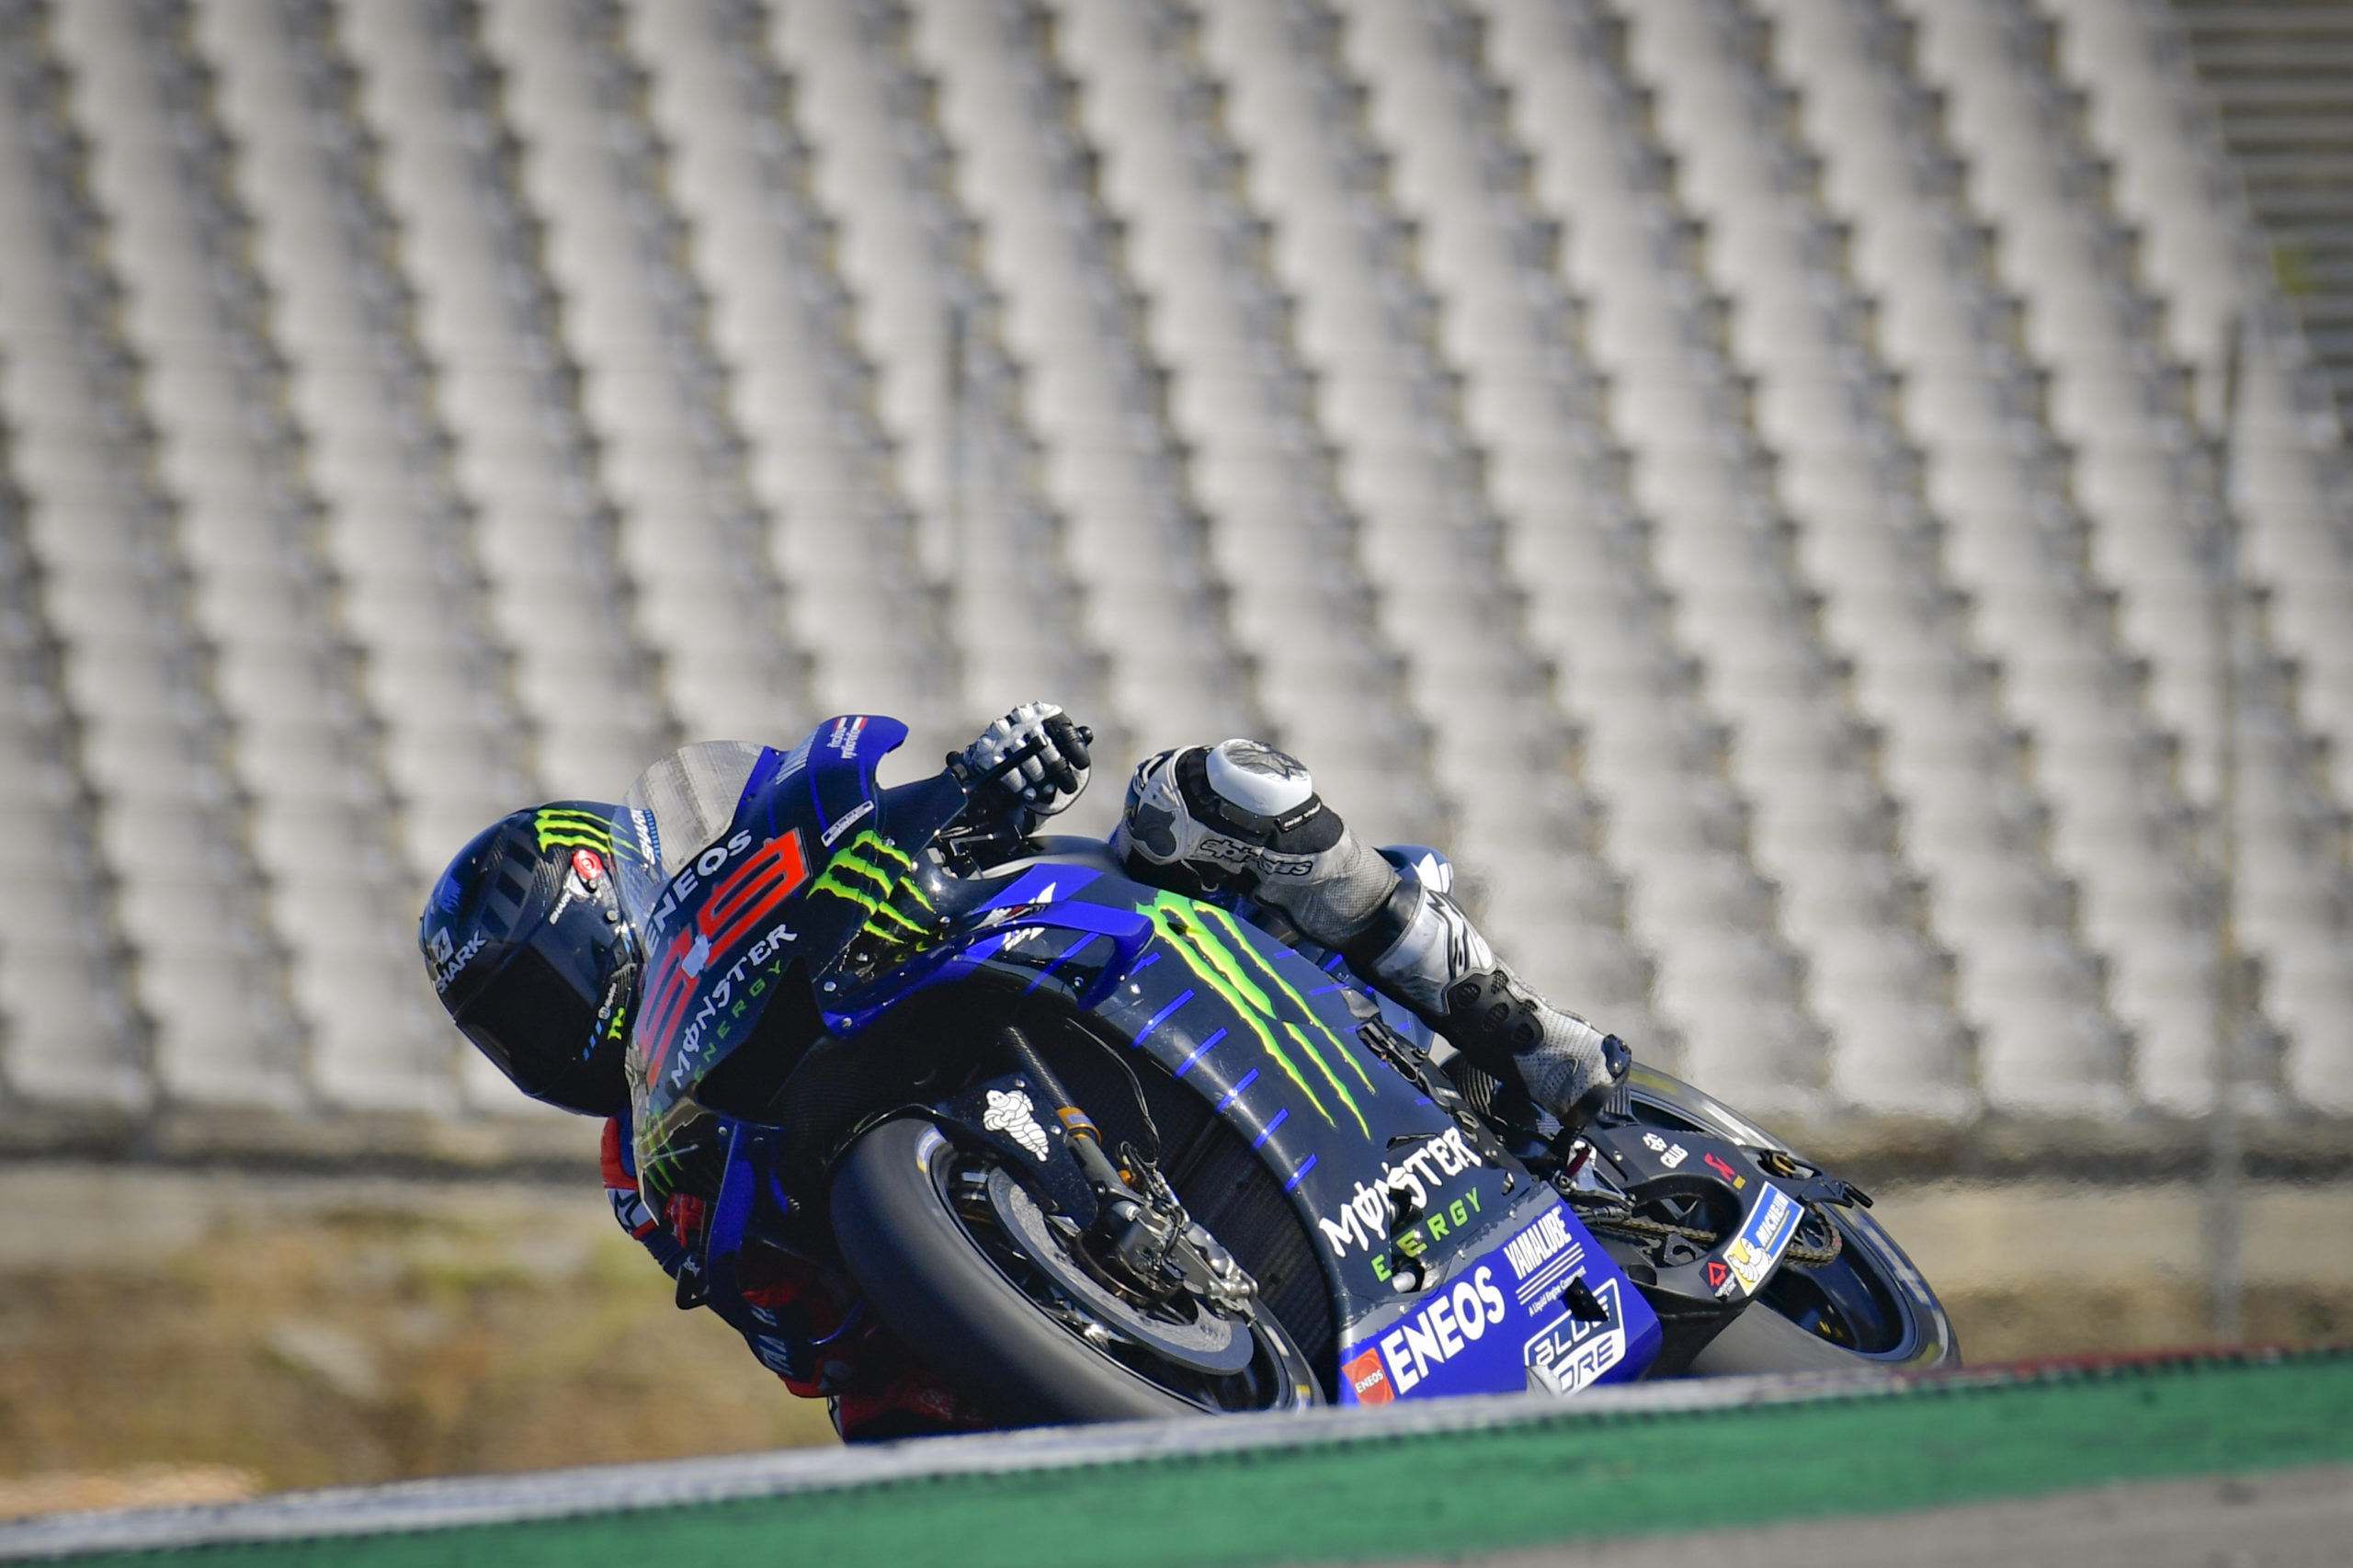 Jorge Lorenzo, Yamaha MotoGP 2020, Portimao test 2020